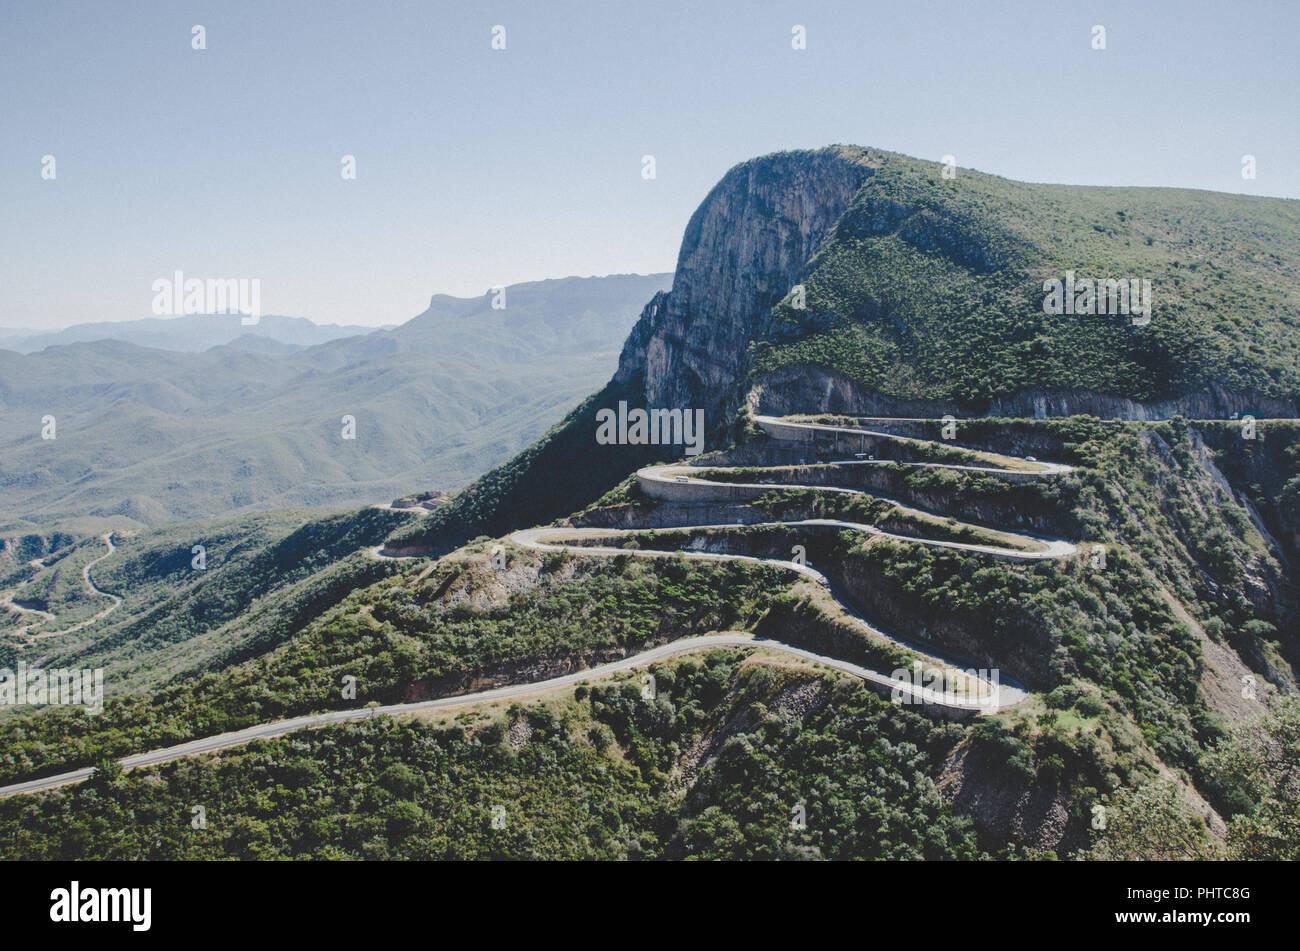 The impressive Serra da Leba mountain pass with many winding curves near Lubango, Angola. - Stock Image